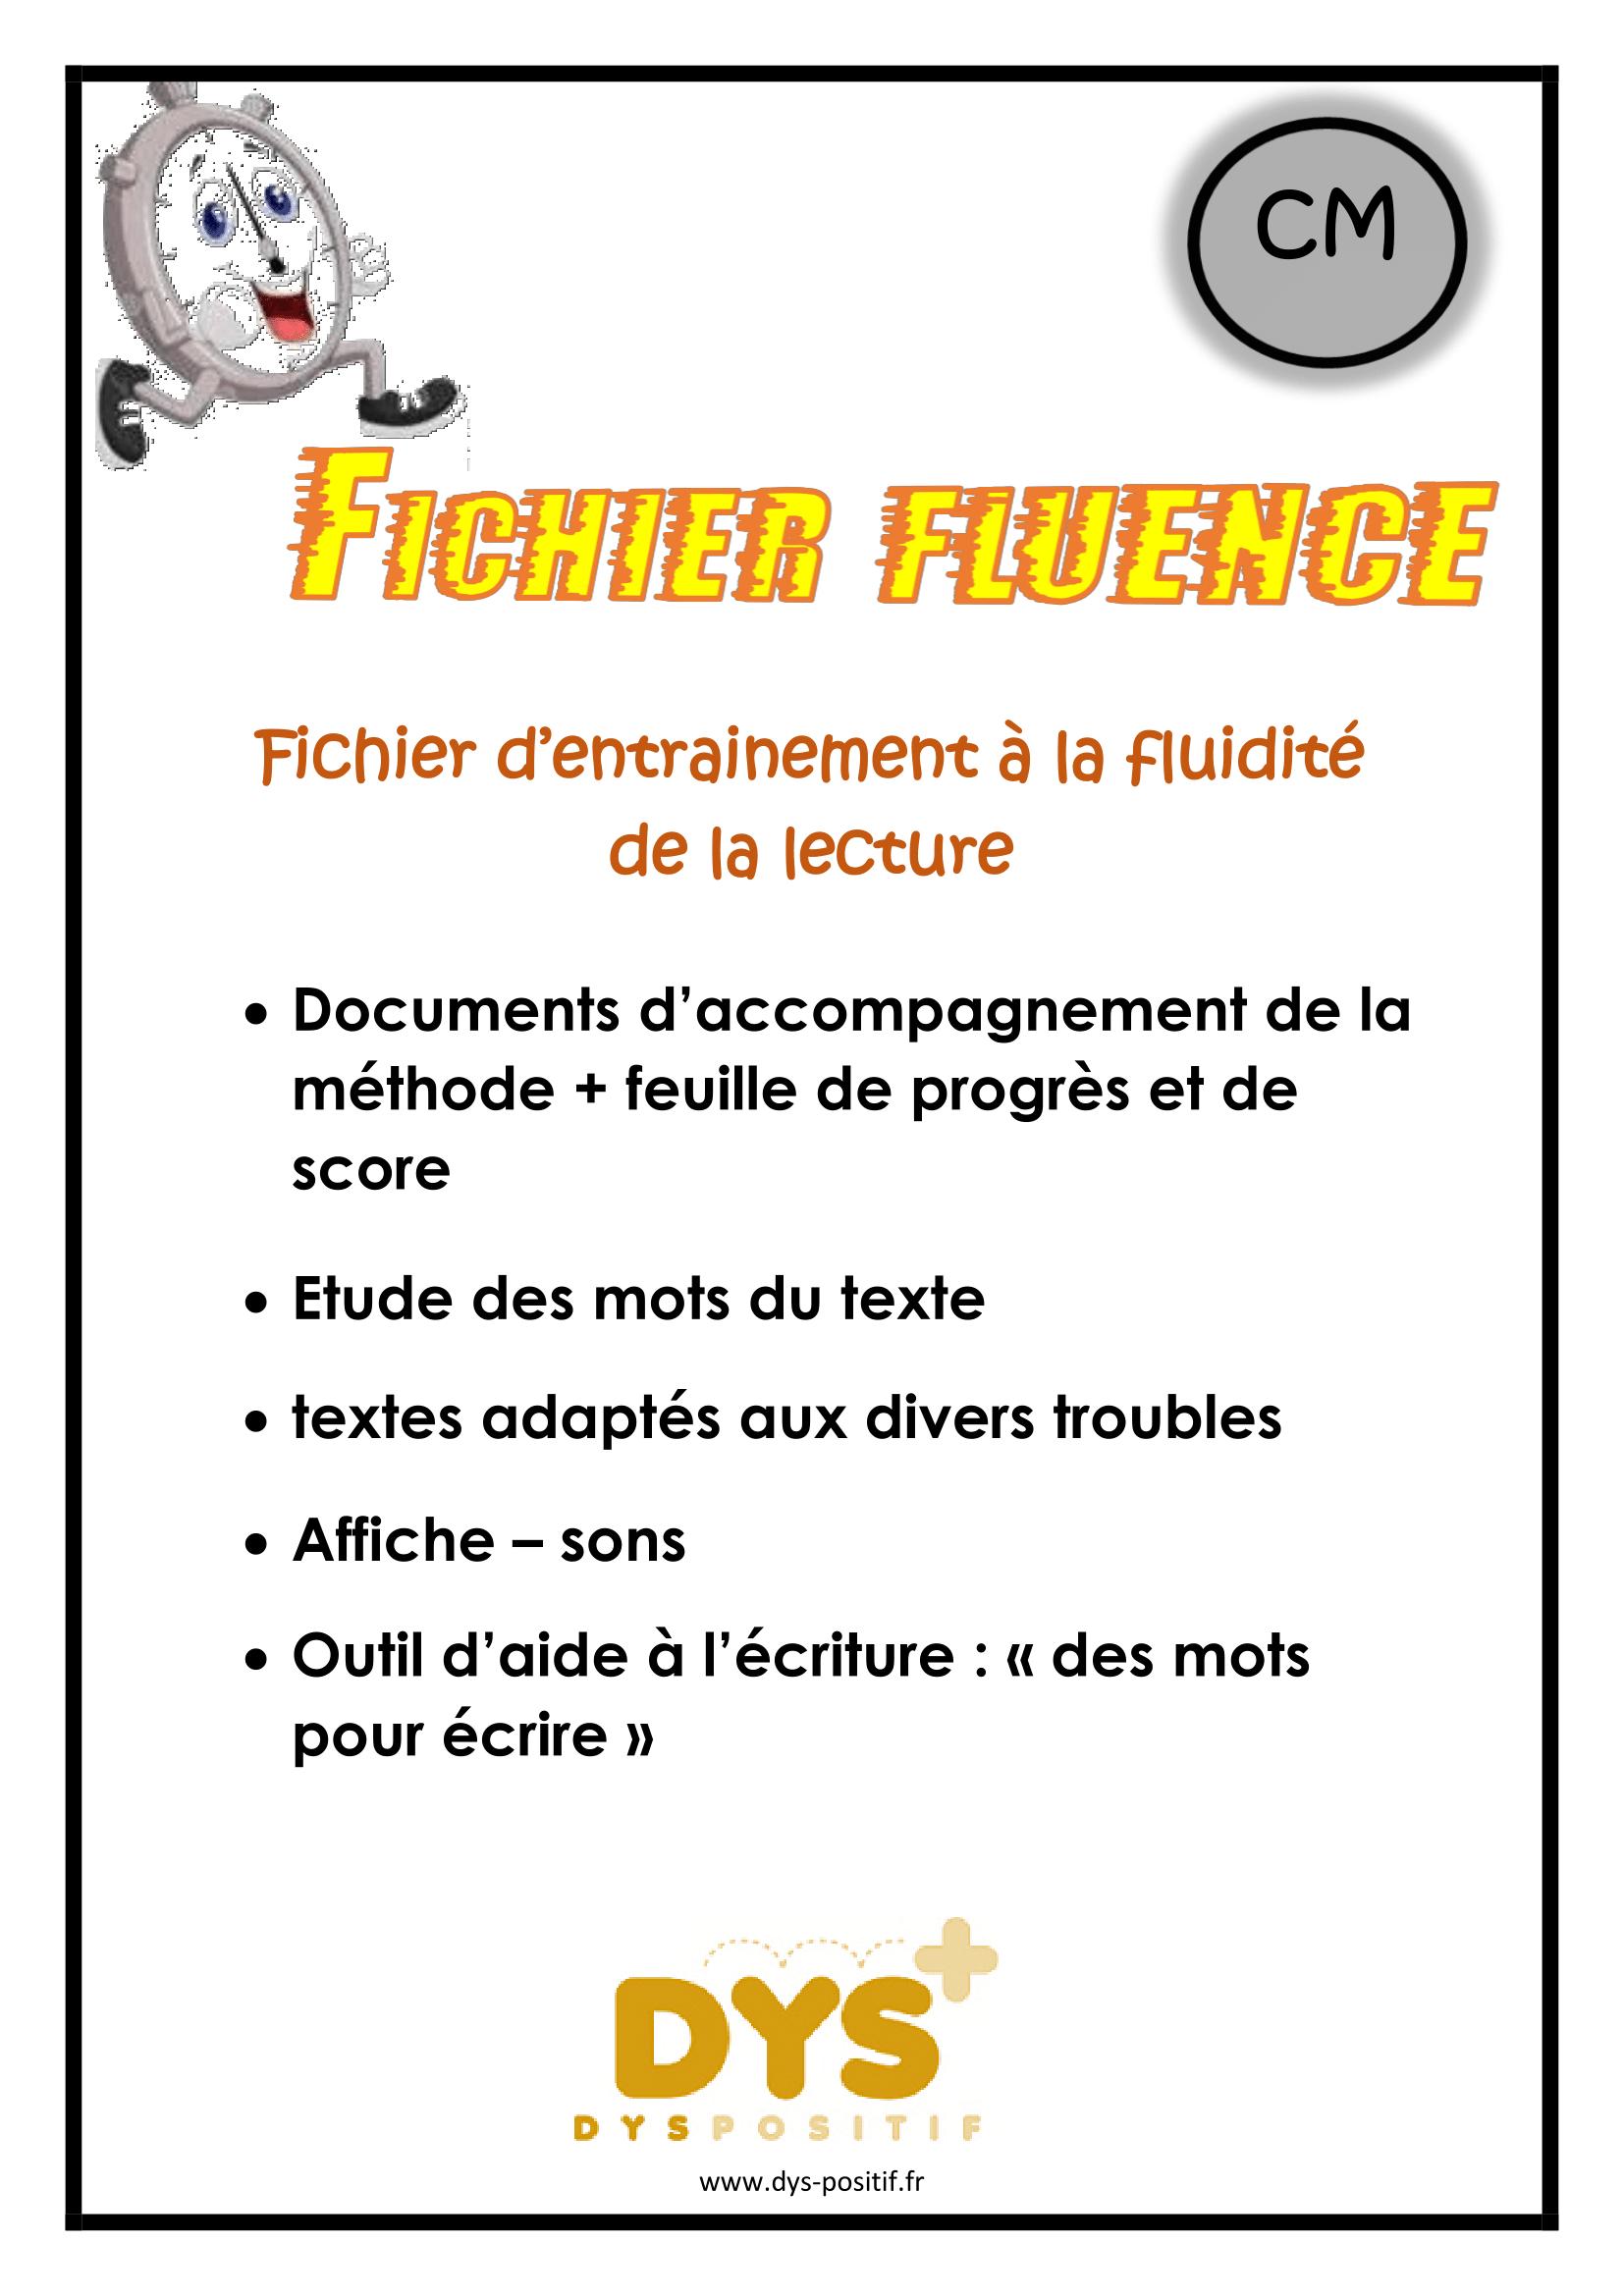 Lecture fluence CM1